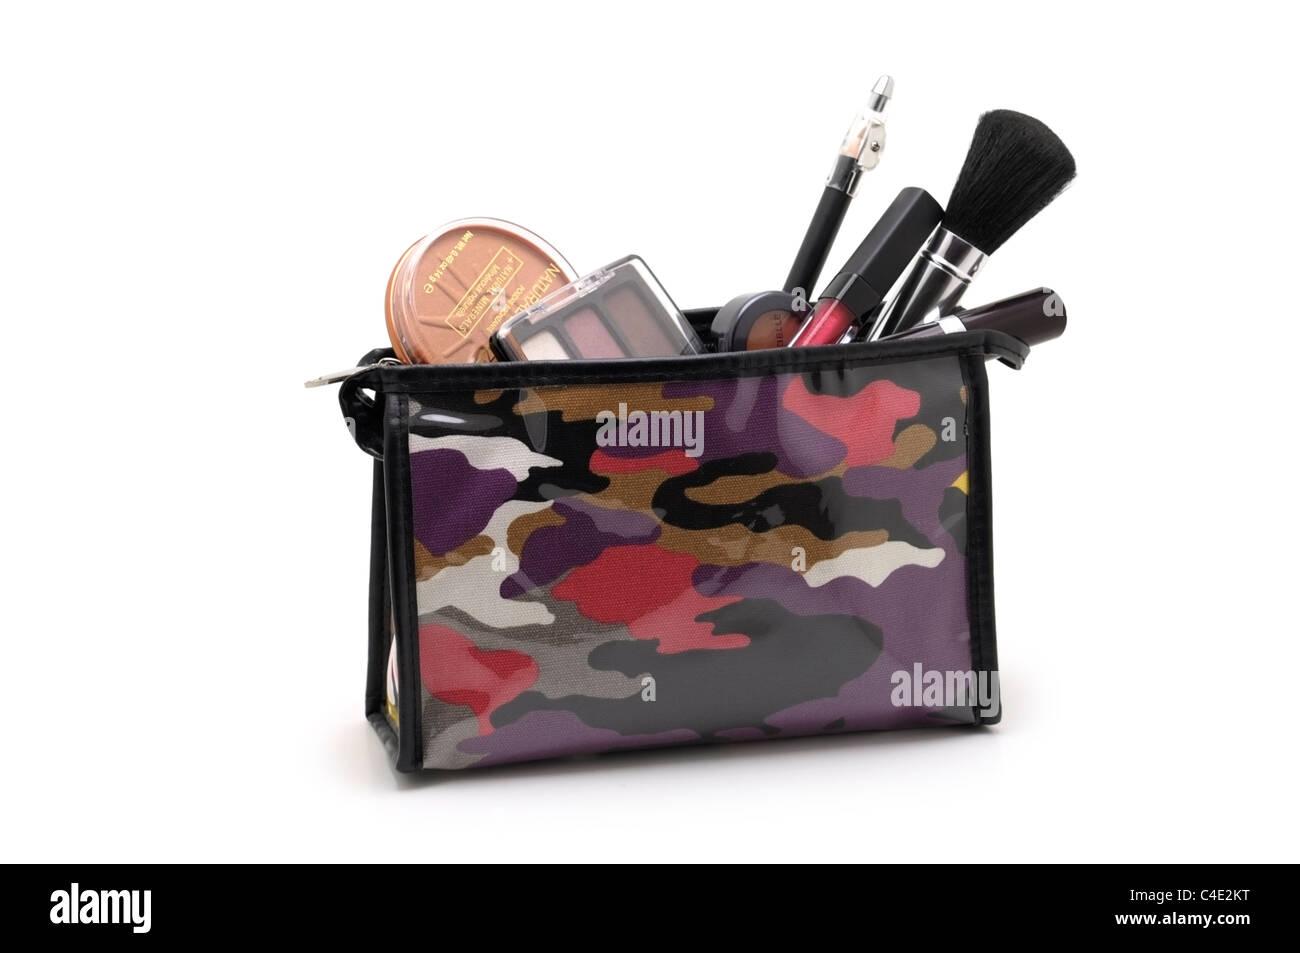 Kosmetik, Make-up-Tasche, Tasche mit Kosmetik Stockbild